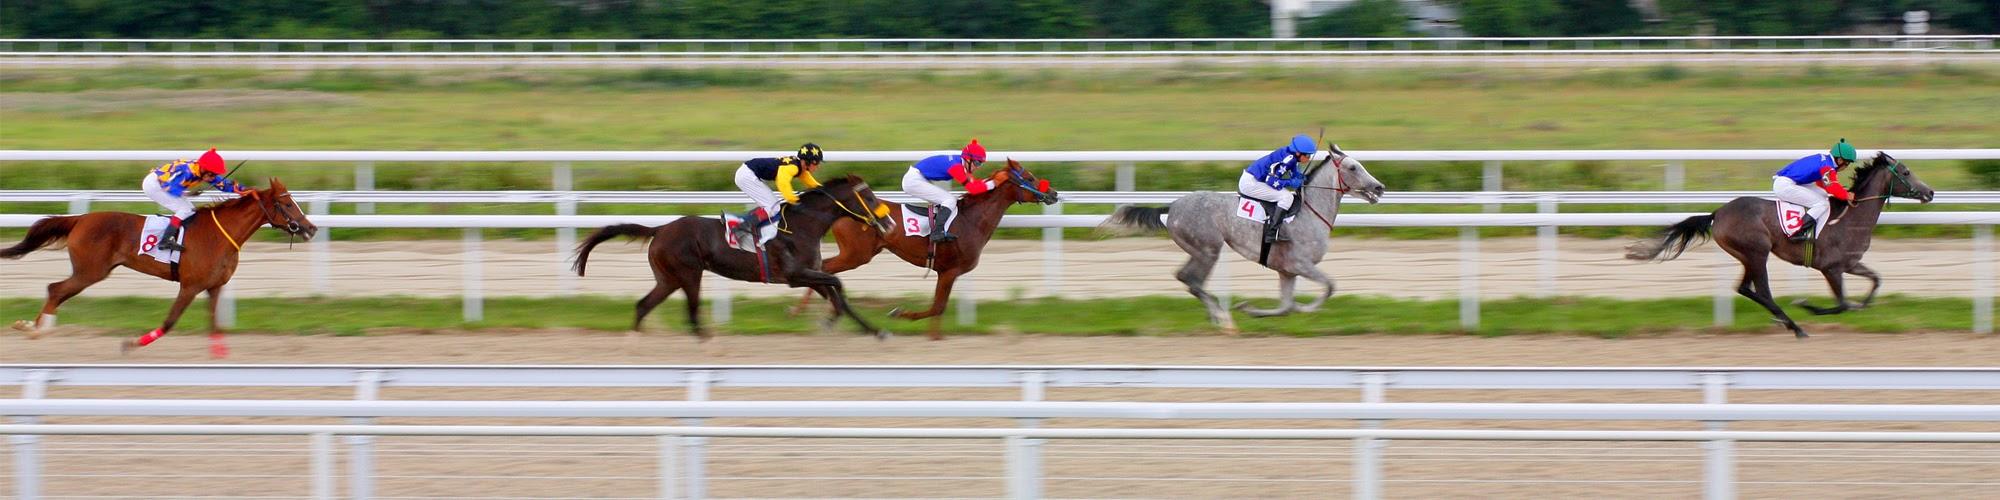 Jockey Equipment   Lexington, KY - KY Jockey Silks